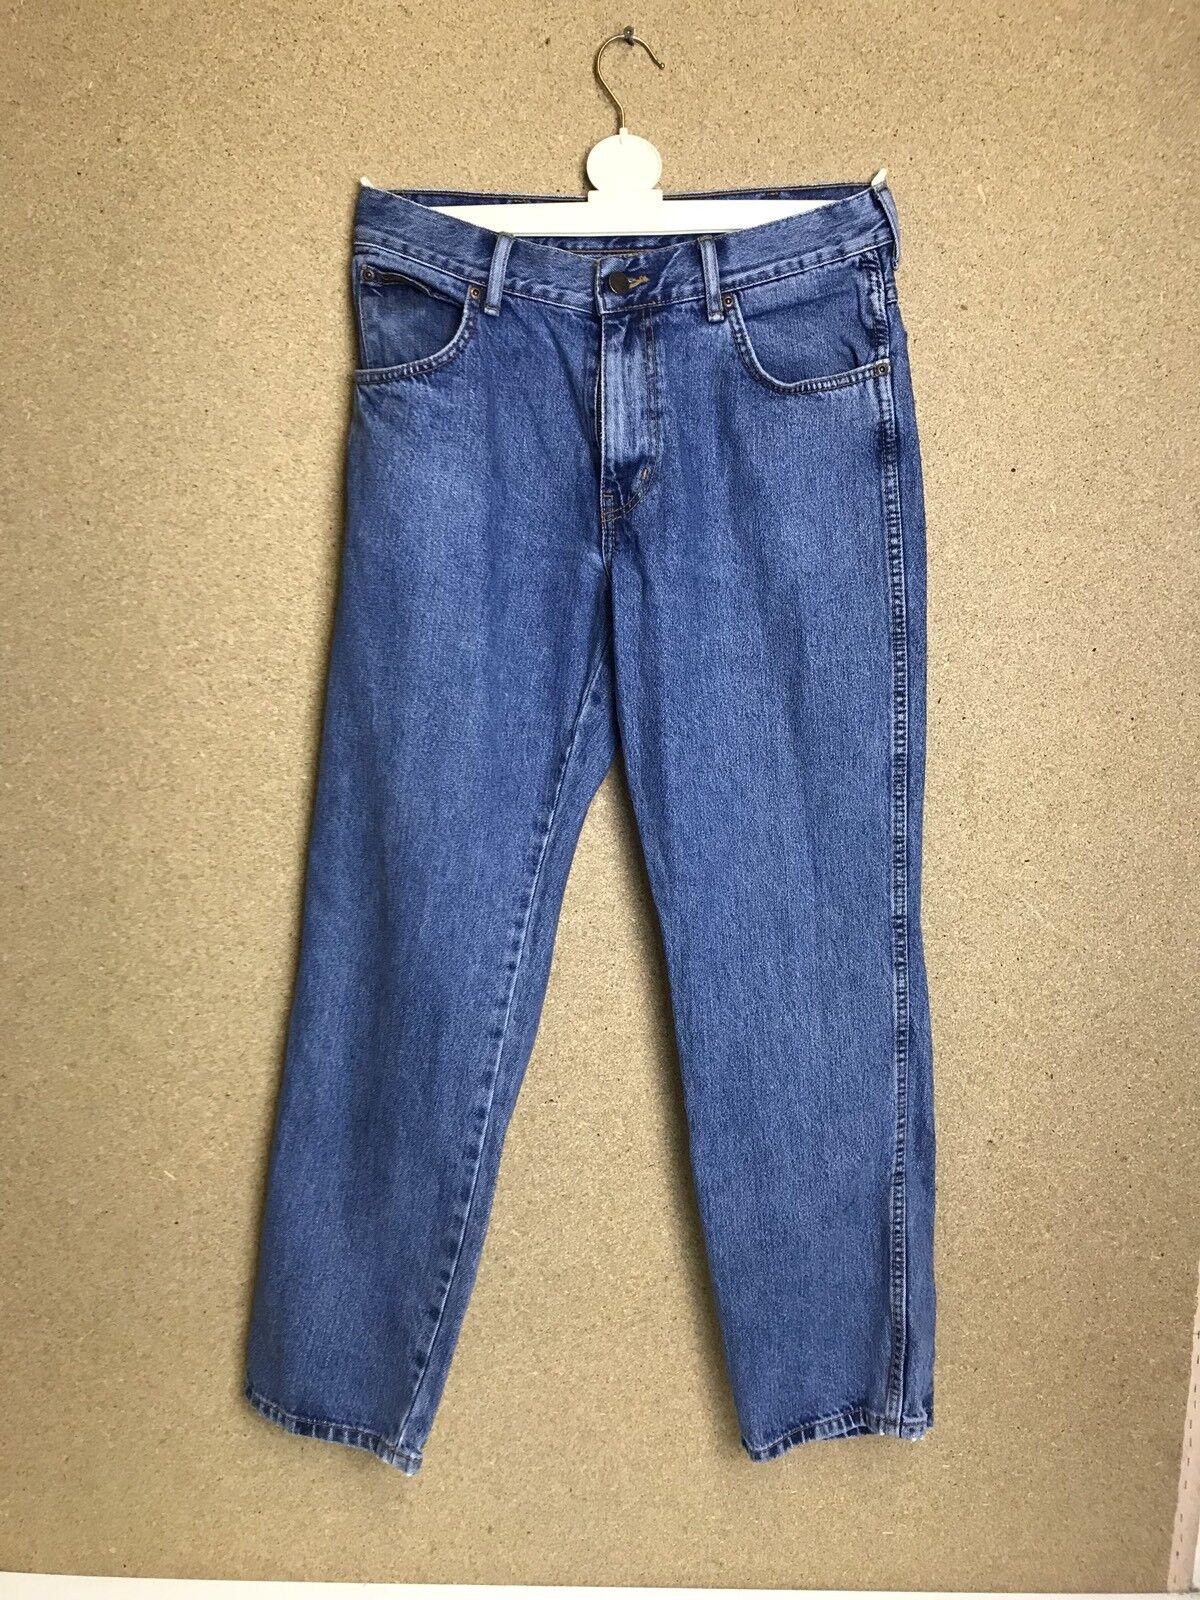 WRANGLER TEXAS Mens Jeans Blau Denim Straight Leg Größe W32 L20 - a27  | Elegantes Aussehen